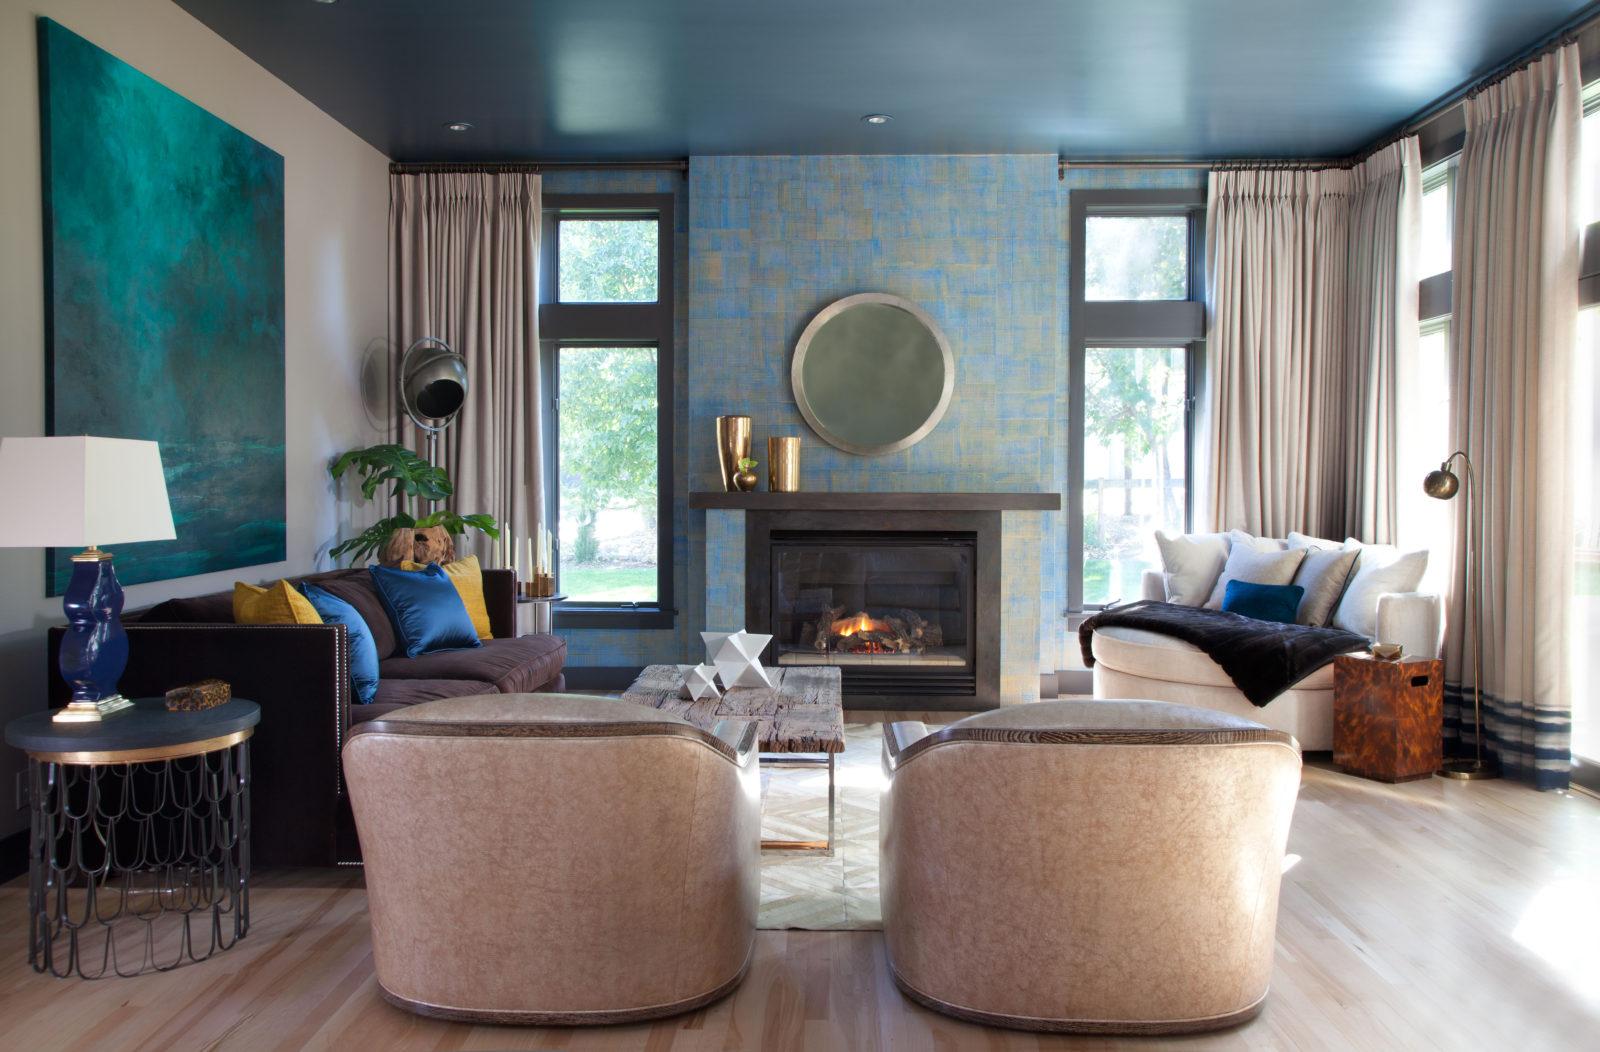 Top Denver Design - 5280 concernant Salon De Jardin Super U